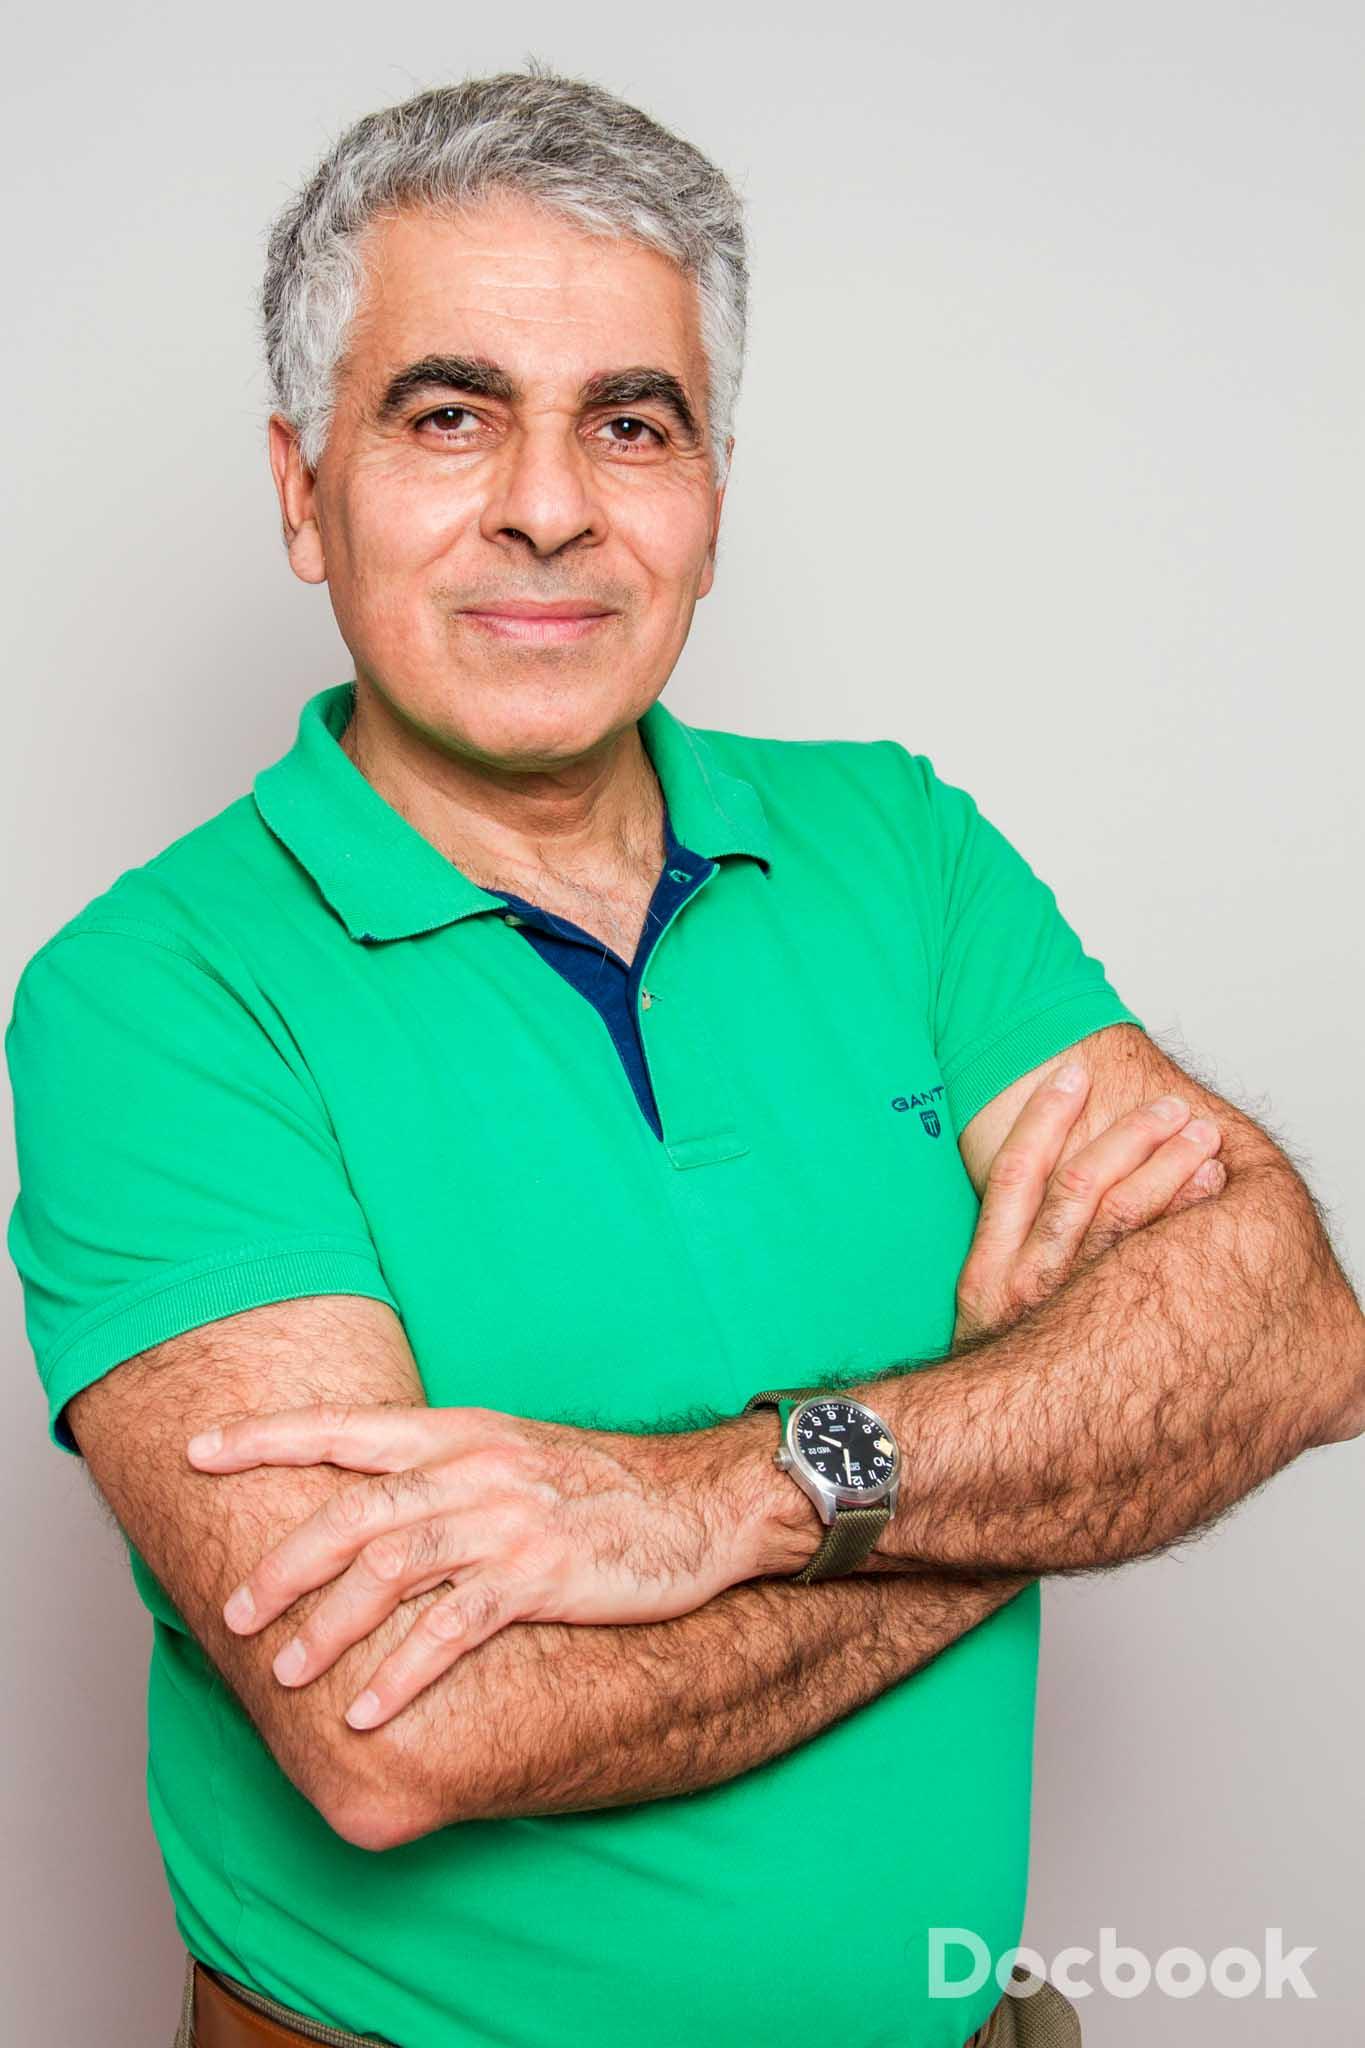 Dr. Soheil Keynejad